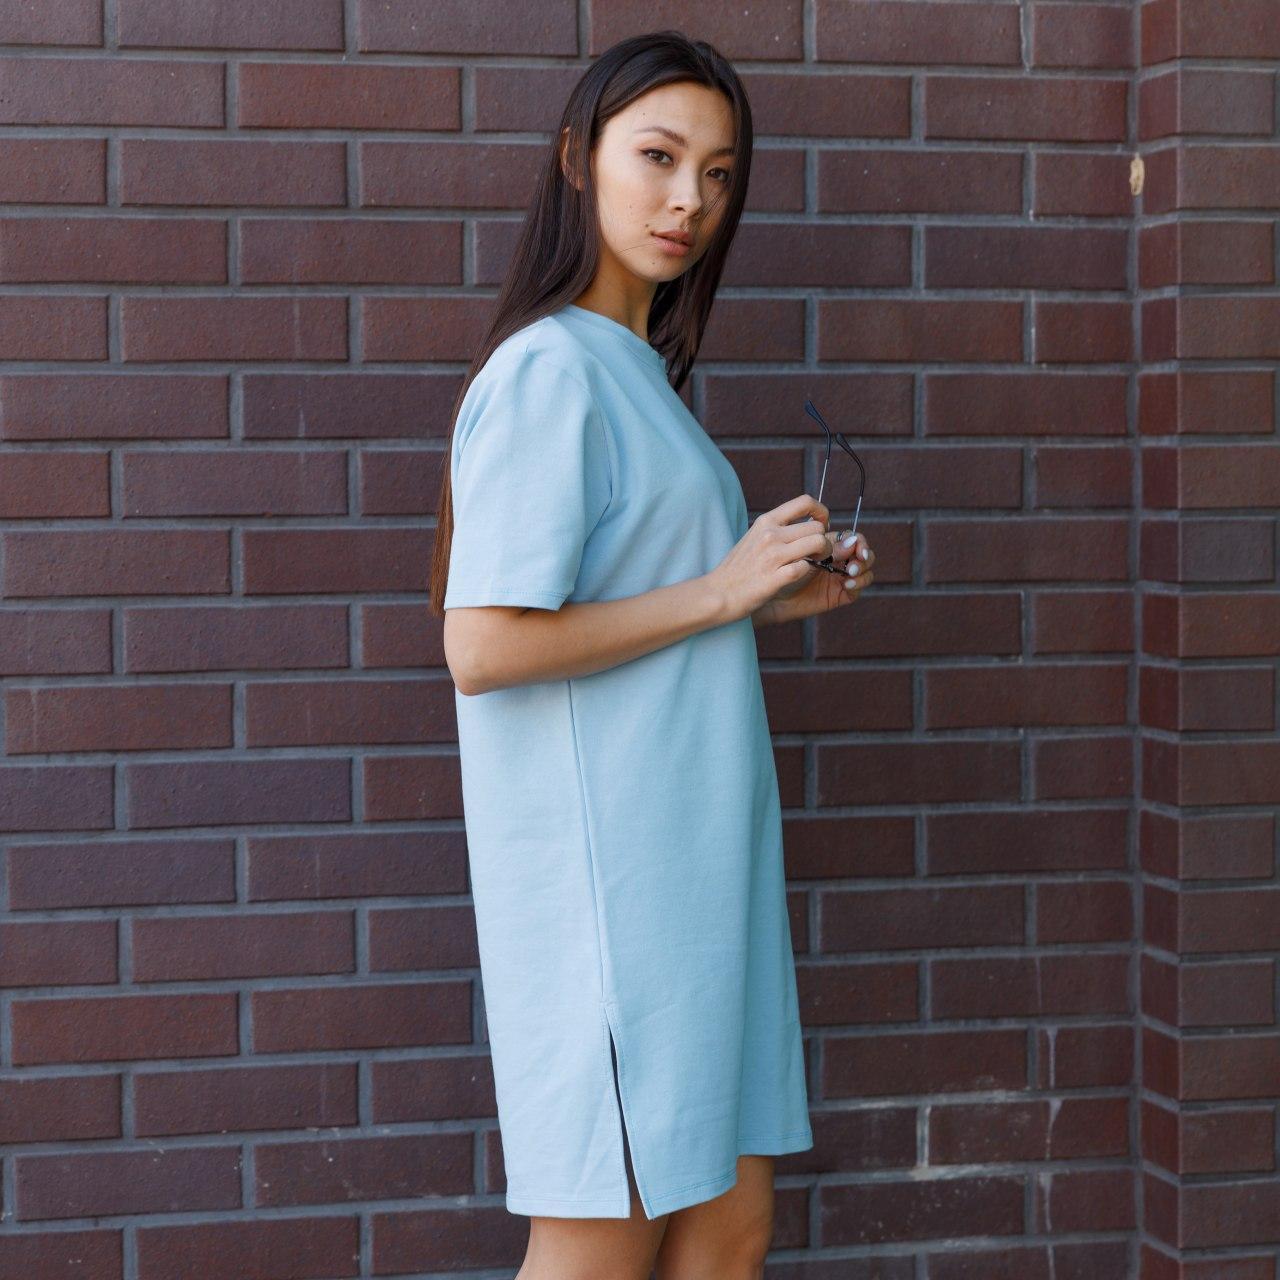 Платье-футболка женское голубое бренд ТУР модель Сарина (Sarina)